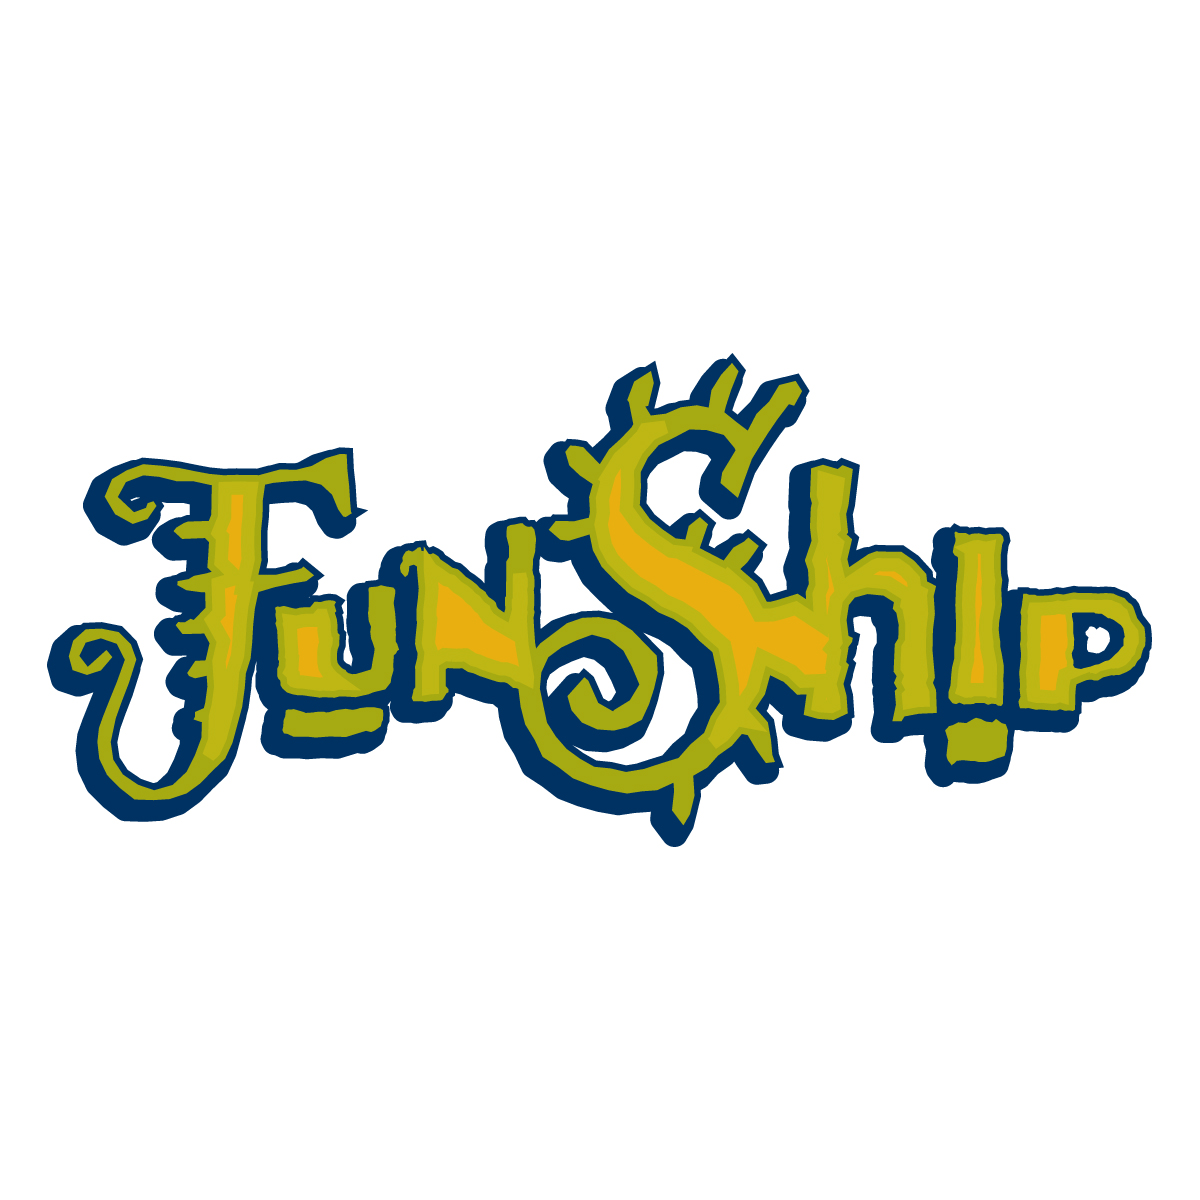 Funship_logo_01.jpg